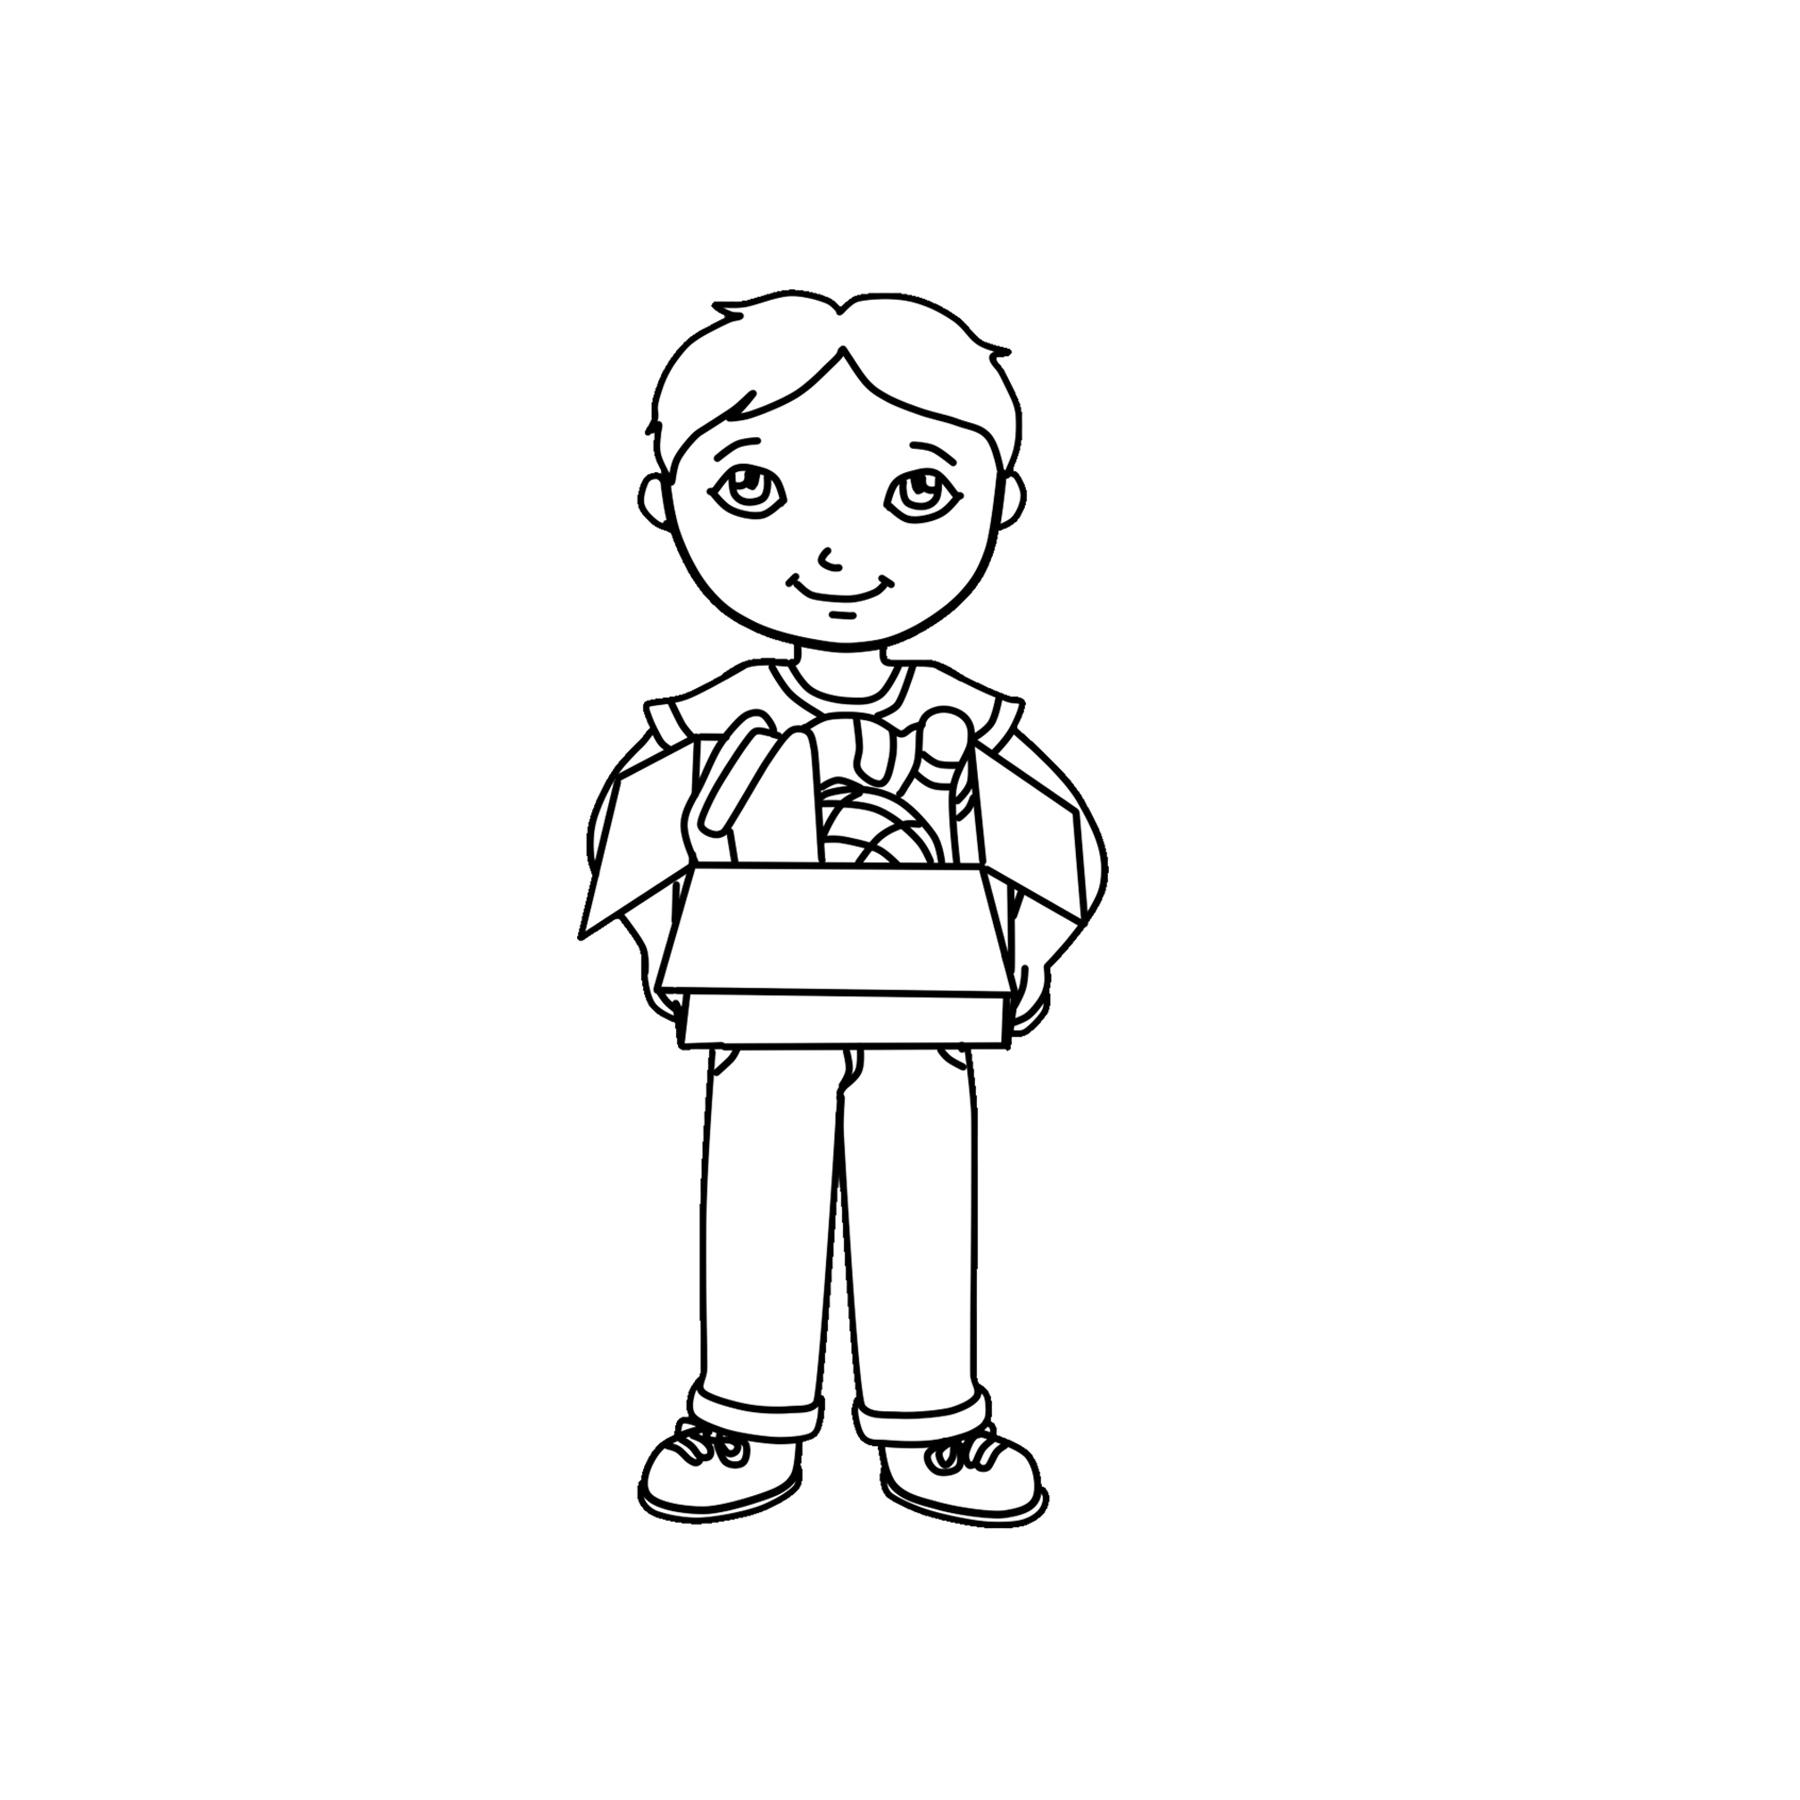 Boy holding clipart black and white jpg black and white library Kid Holding Box Clipart Graphic - Free Clipart - Clipart 4 School jpg black and white library